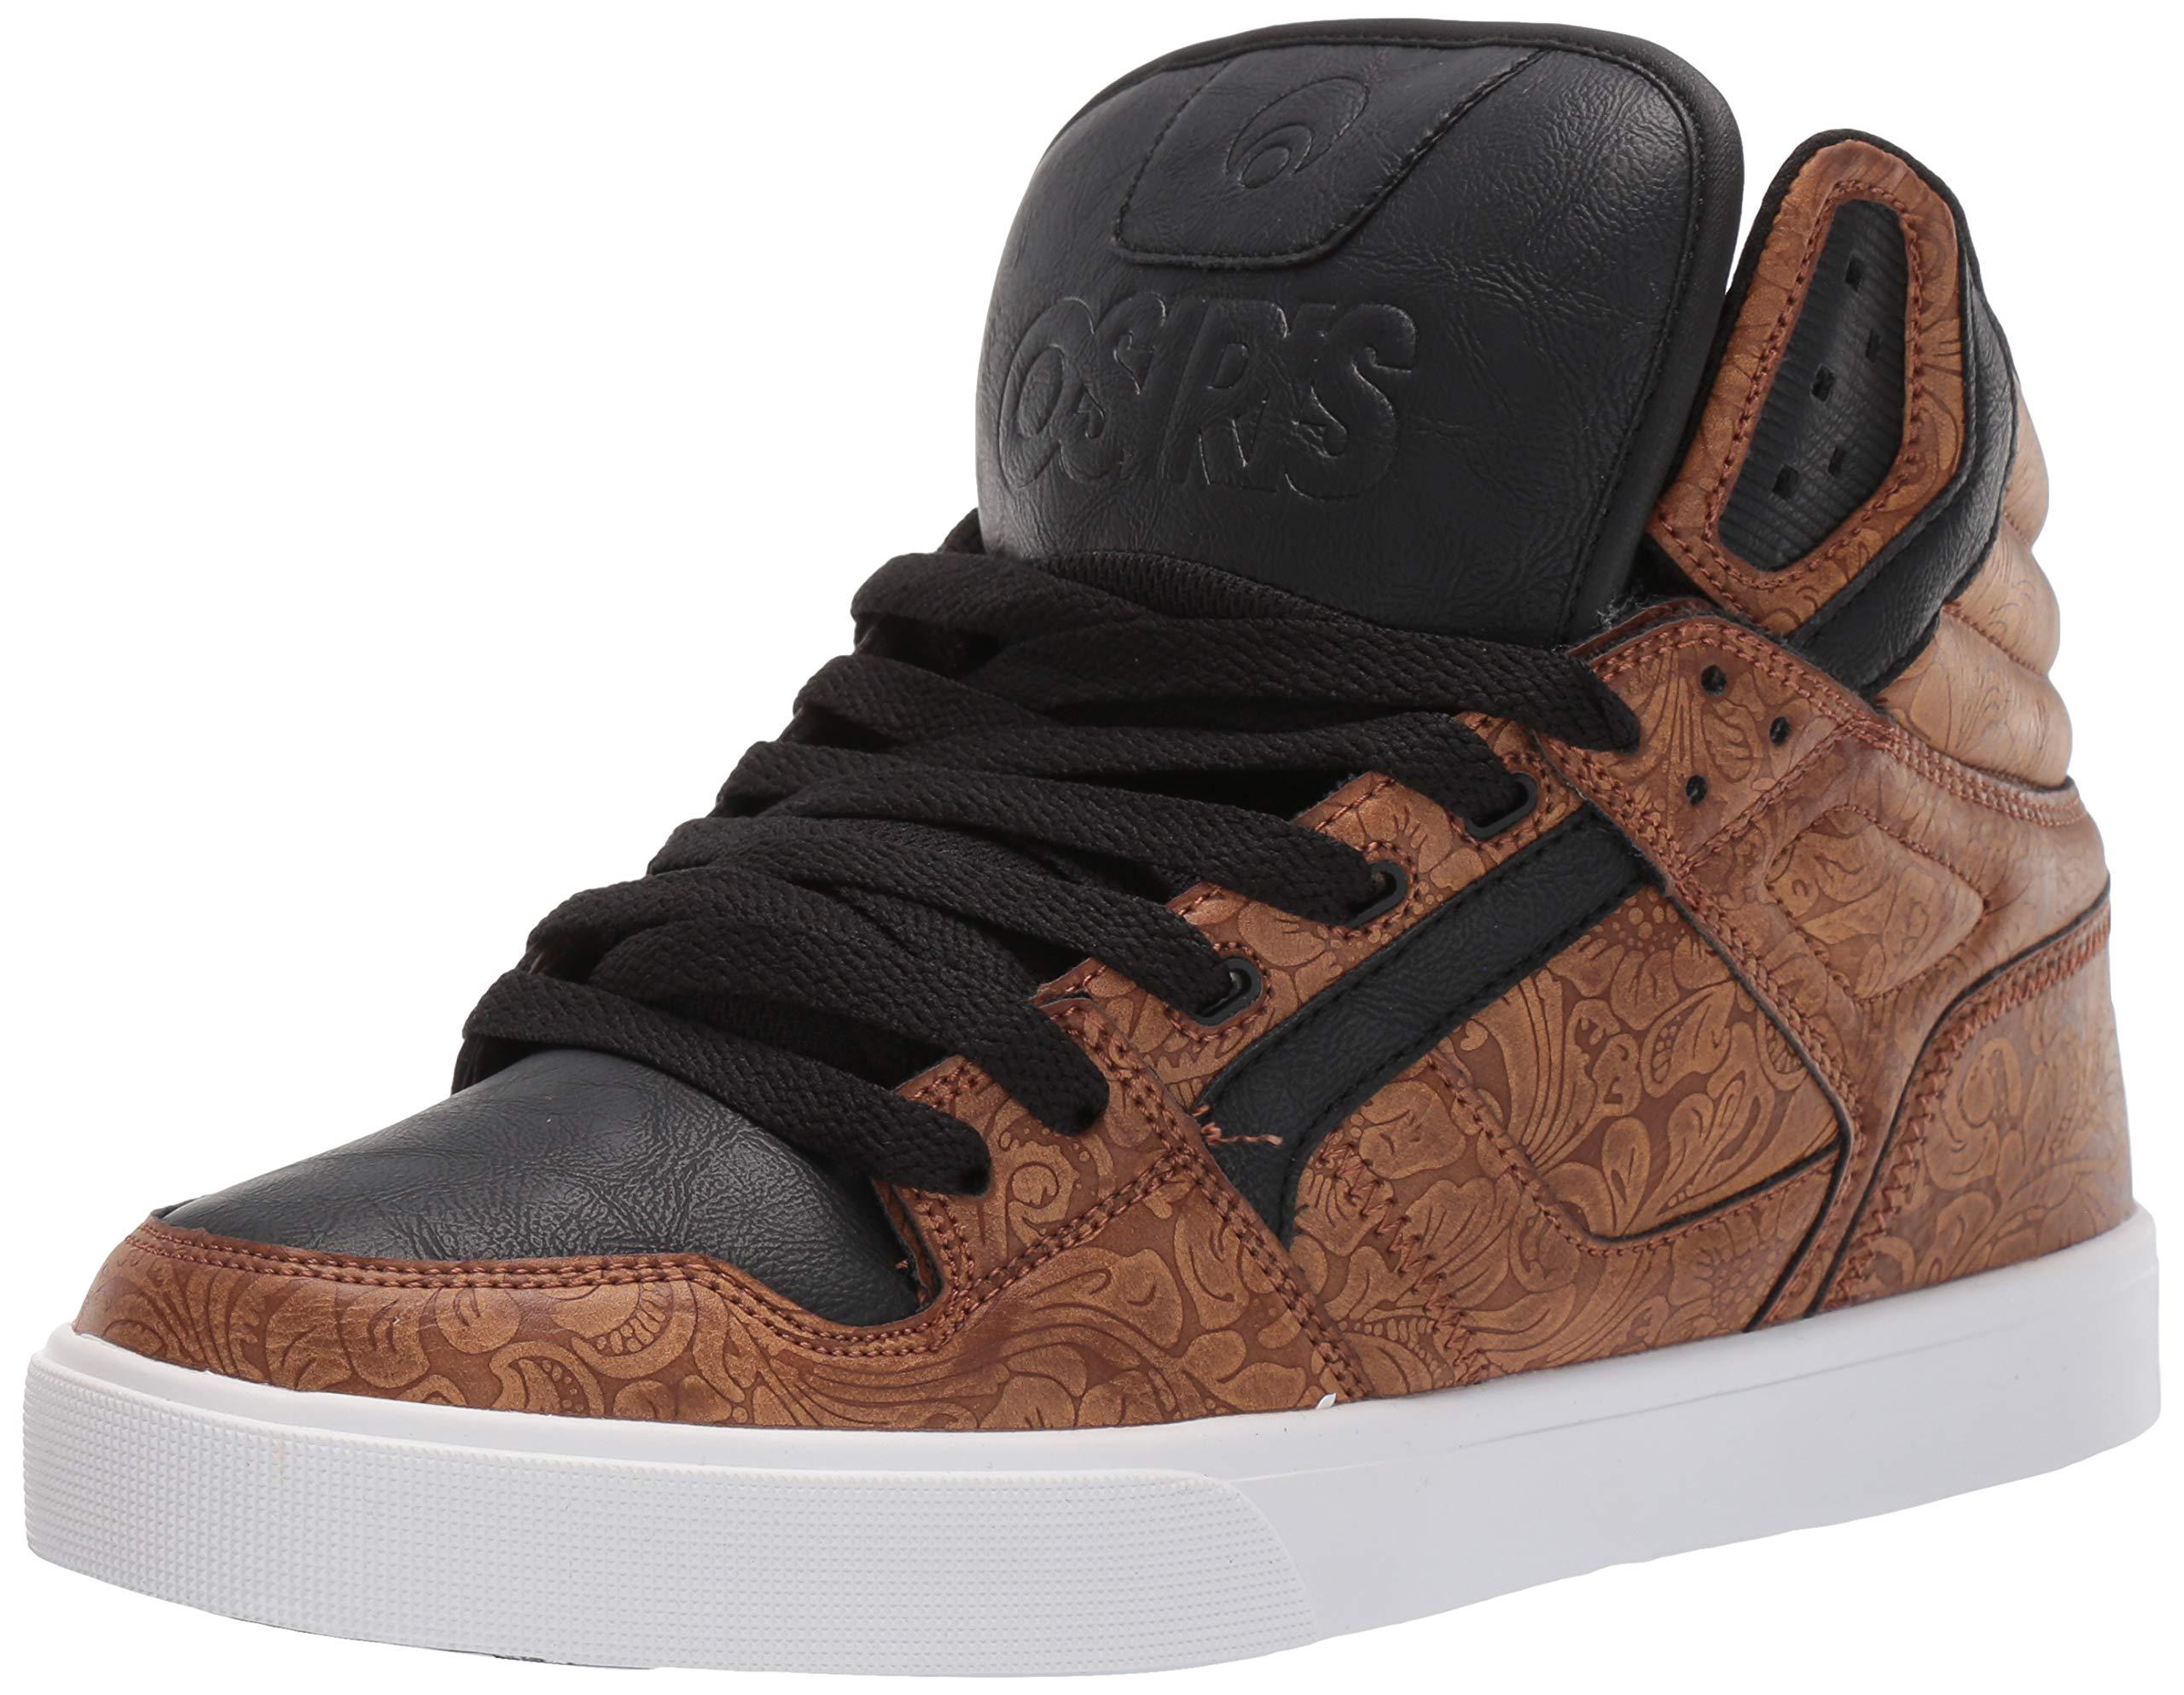 Osiris Men's Clone Skate Shoe High Plains/Brown 9 M US by Osiris